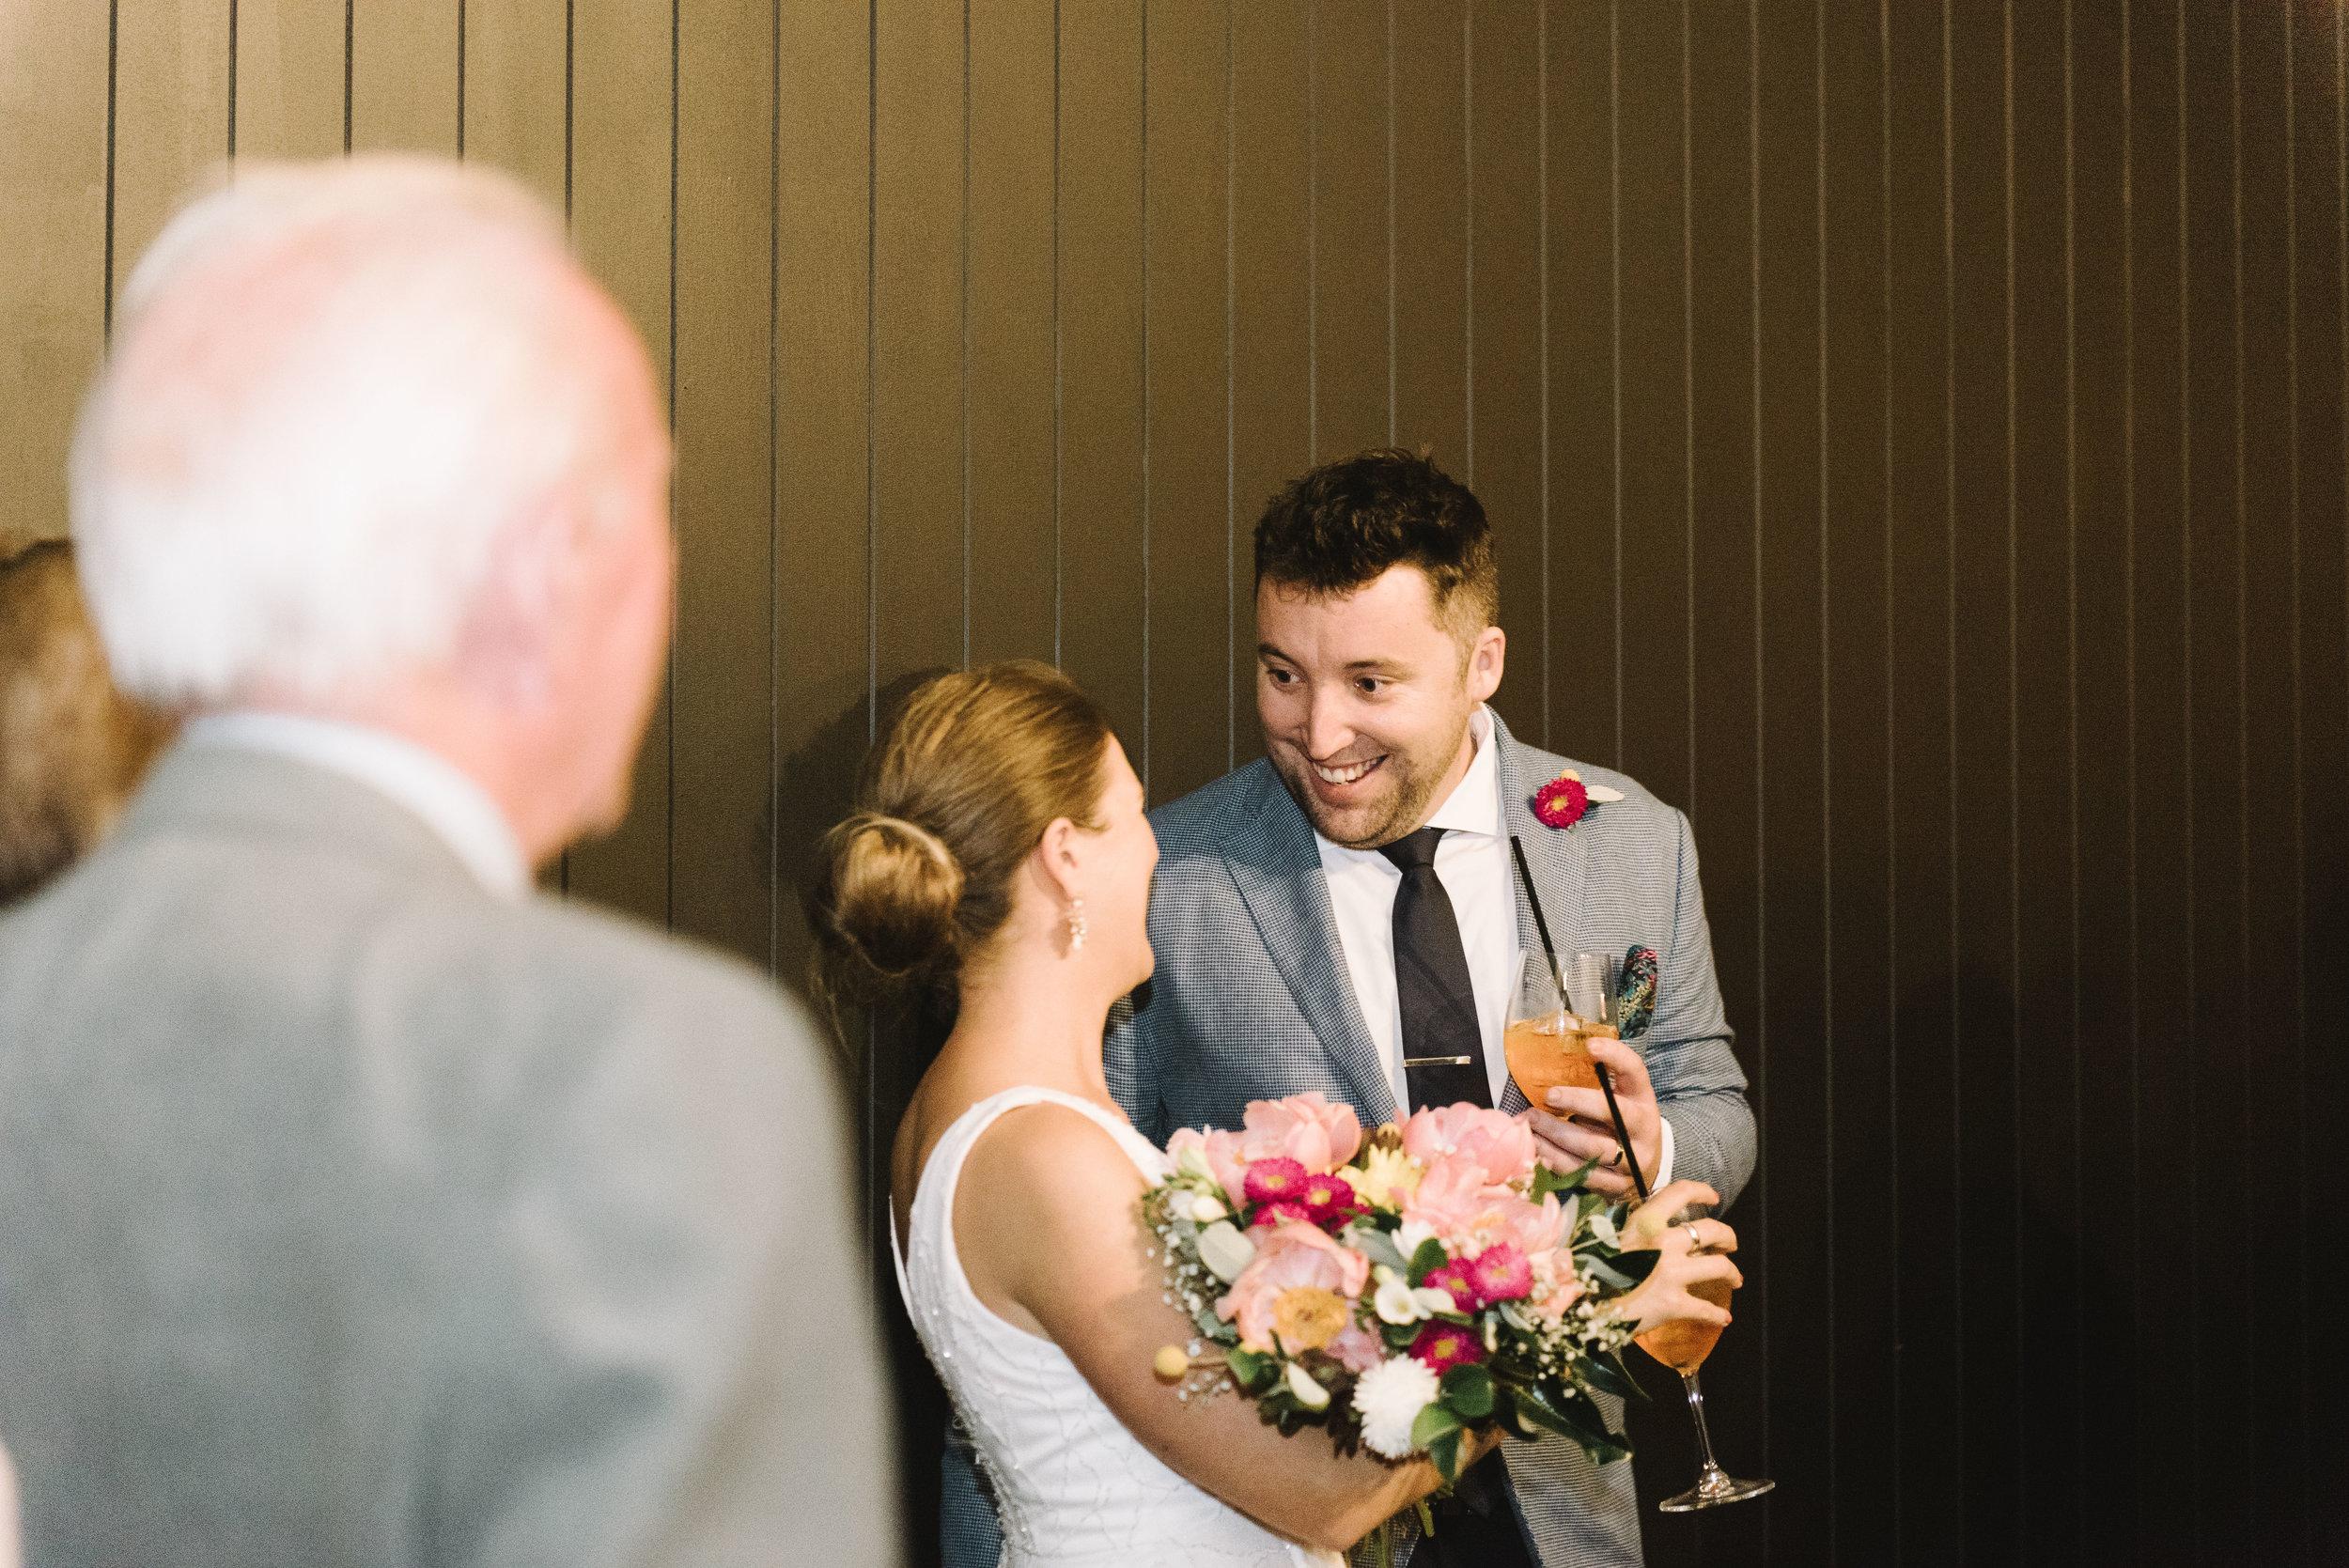 refinery-wedding-brisbane-city-wedding-photographer-85.jpg